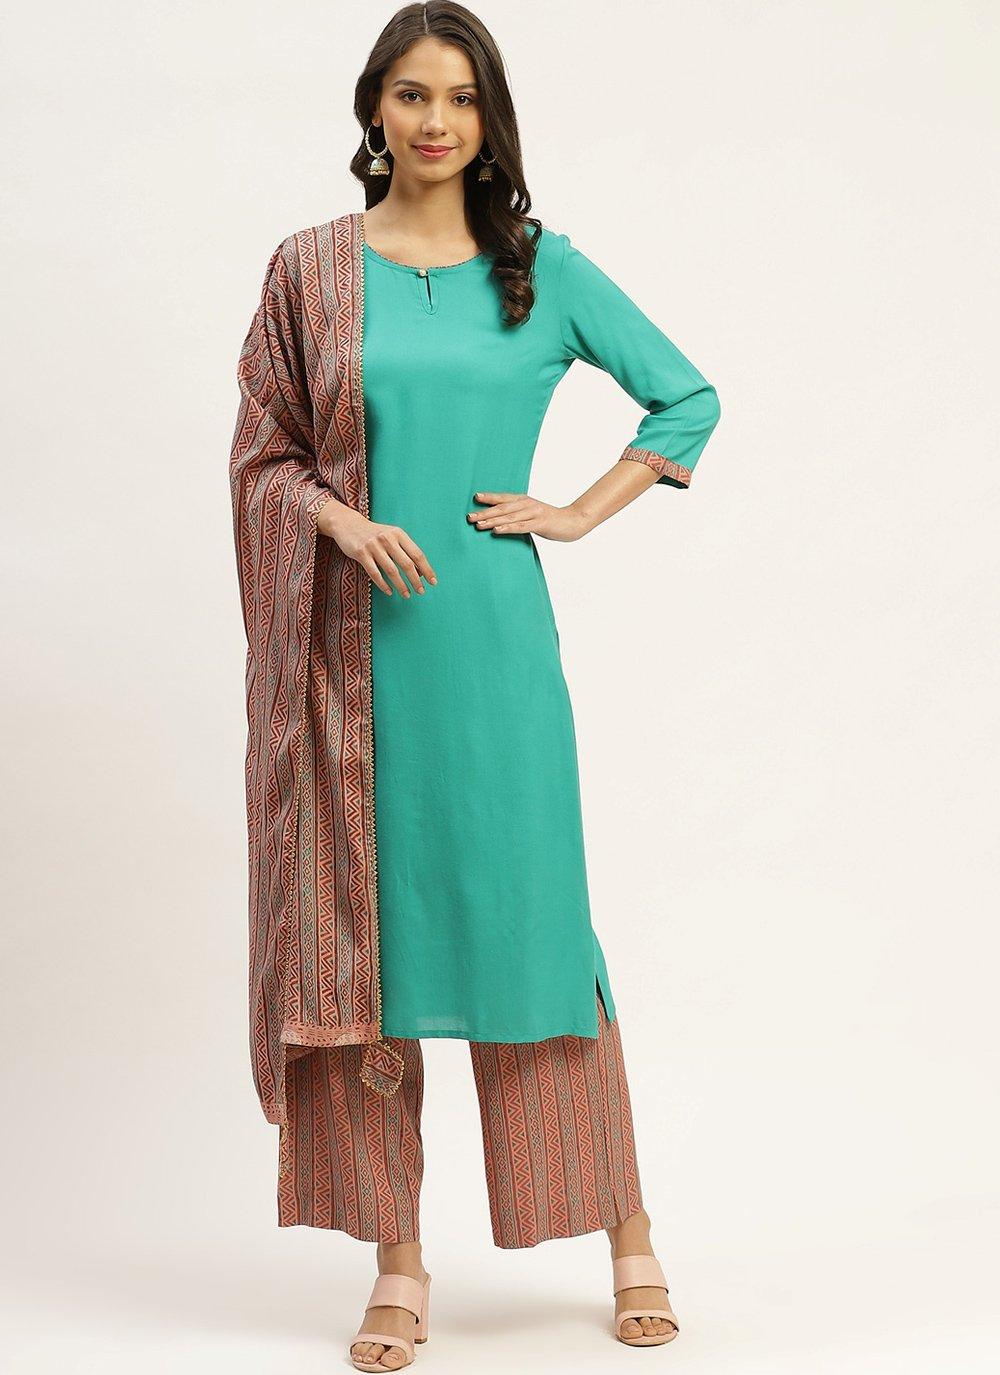 Sea Green Rayon Readymade Suit